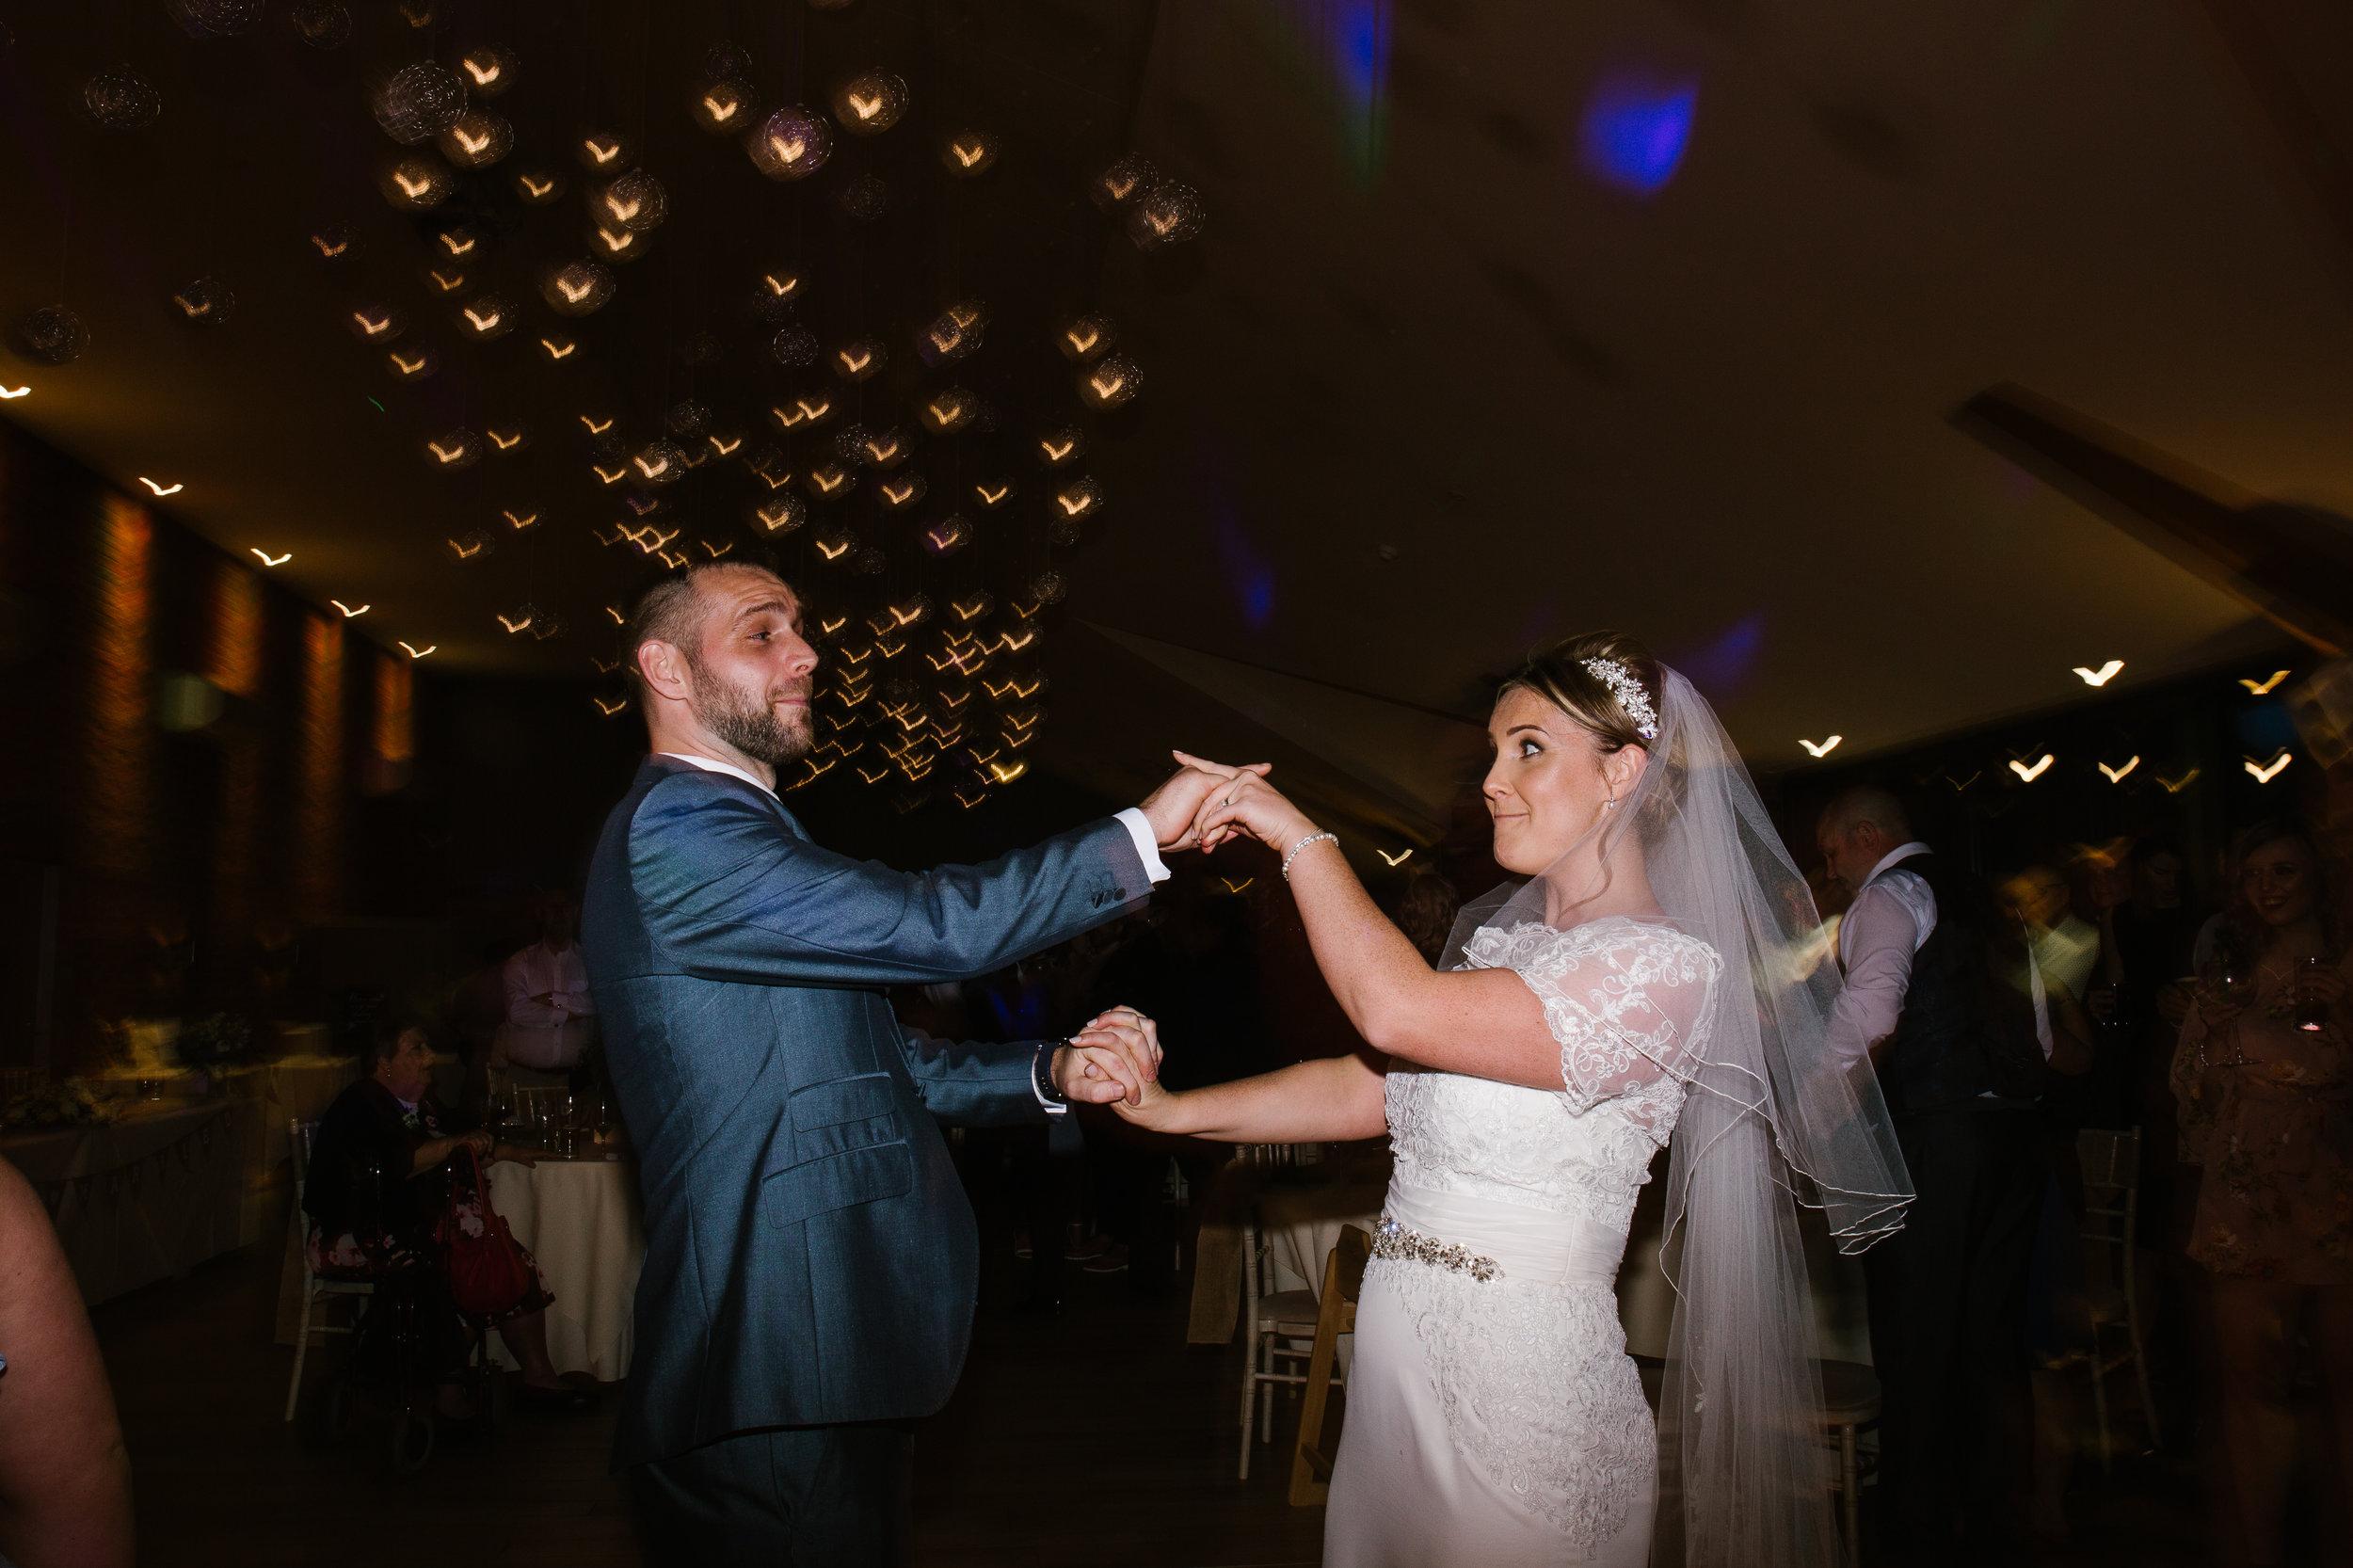 newlyweds dancing together at their fun wedding at aston marina